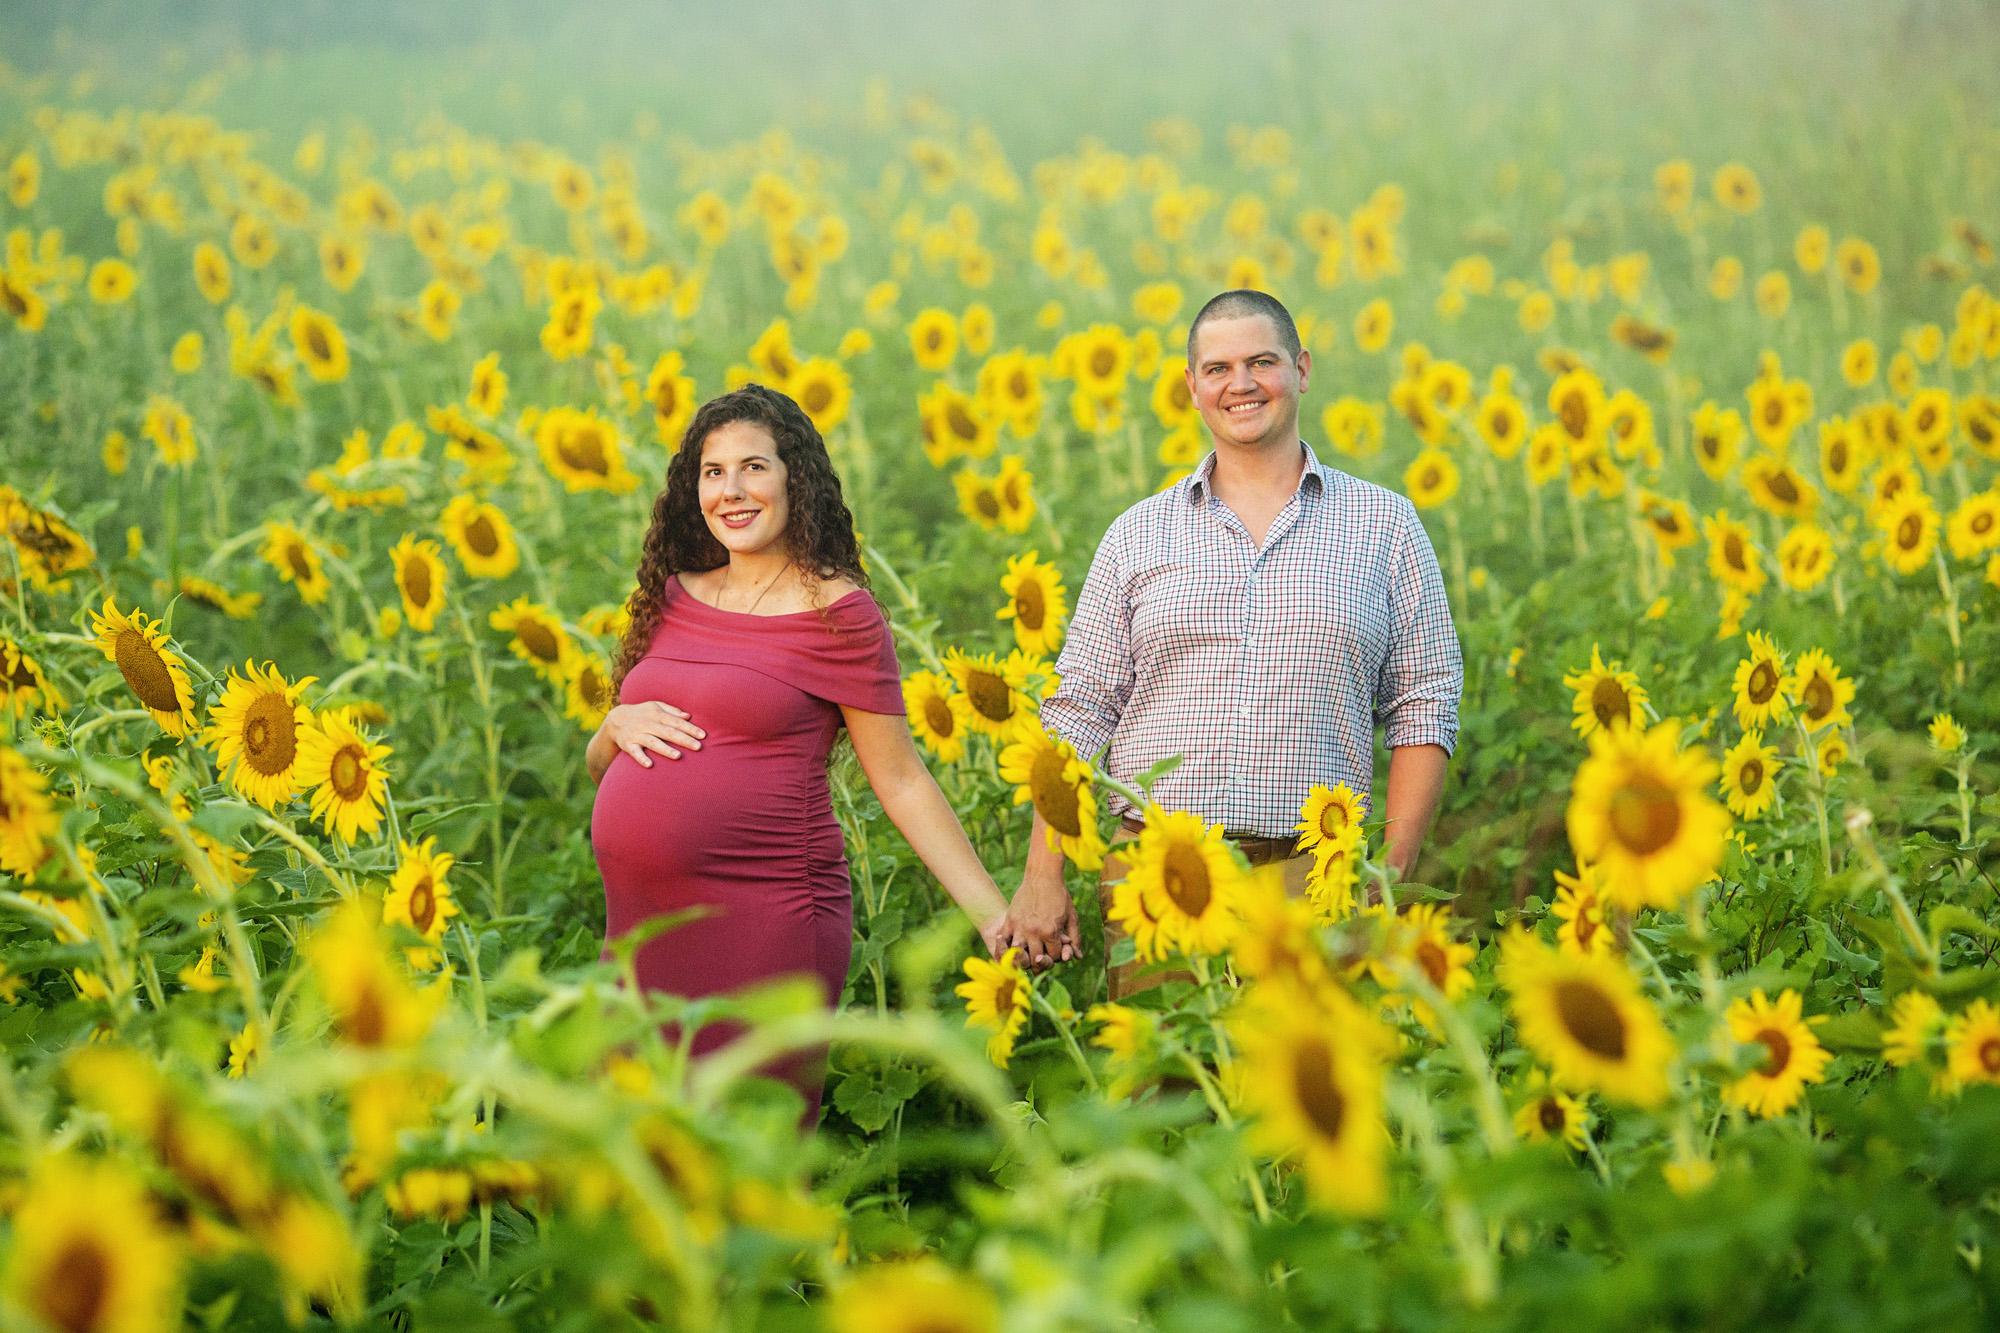 Seriously_Sabrina_Photography_Lexington_Frankfort_Kentucky_Maternity_Mini_Sunflowers_Johns1.jpg